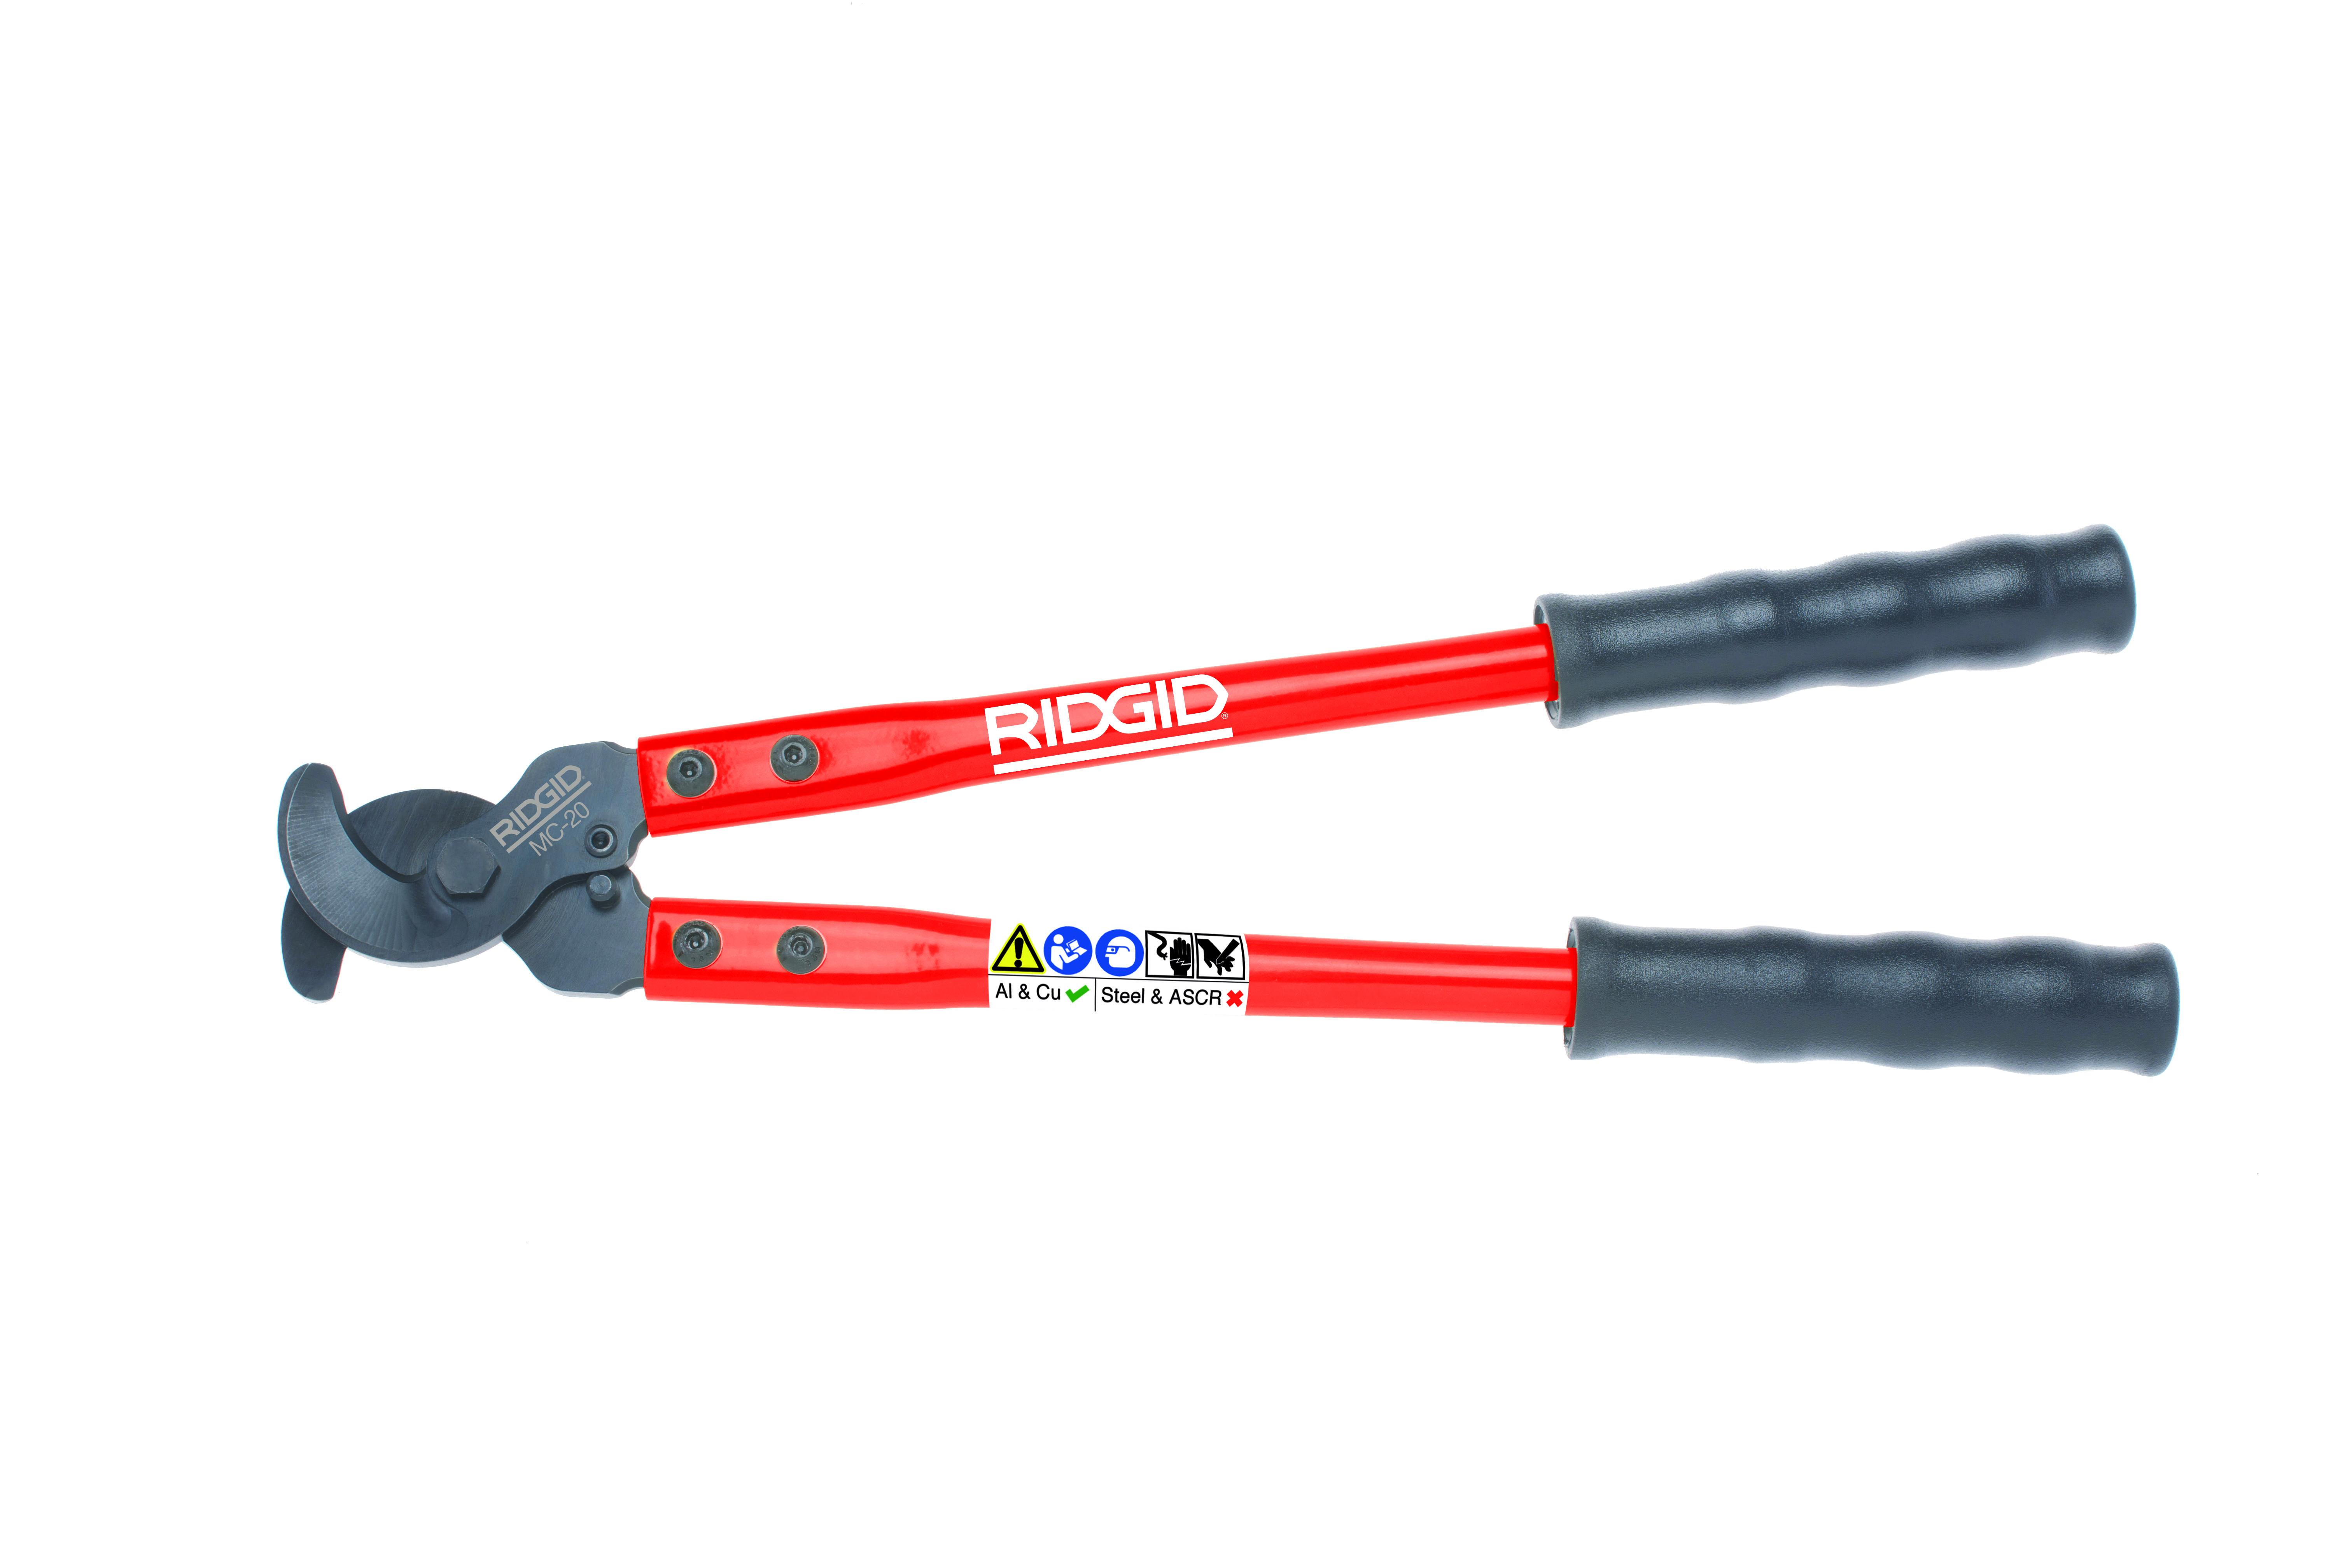 RIDGID 54273/MC20 - MC-20 Manual Leverage Cable Cutter 120mm2 & 20mm